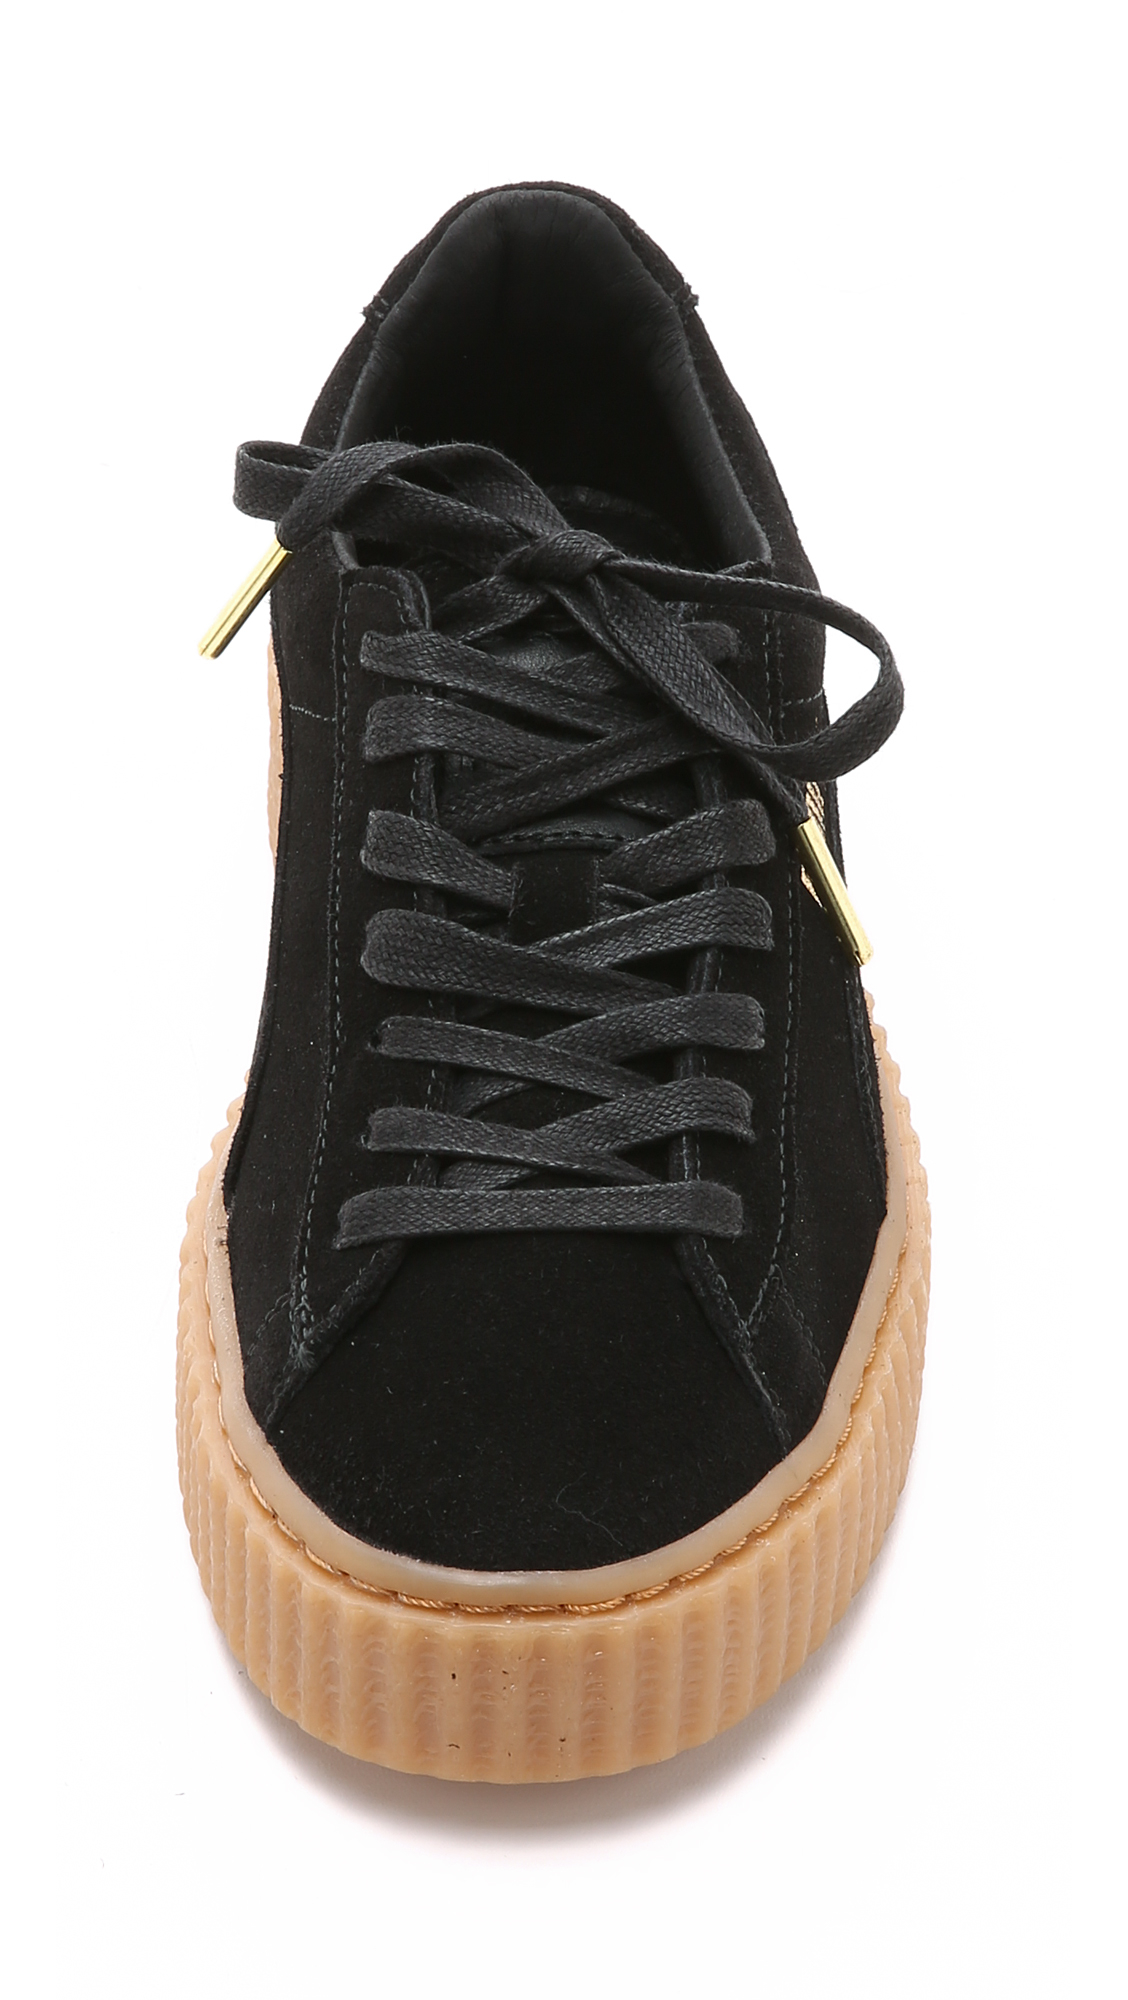 PUMA X Rihanna Creeper Sneakers - Black/gum